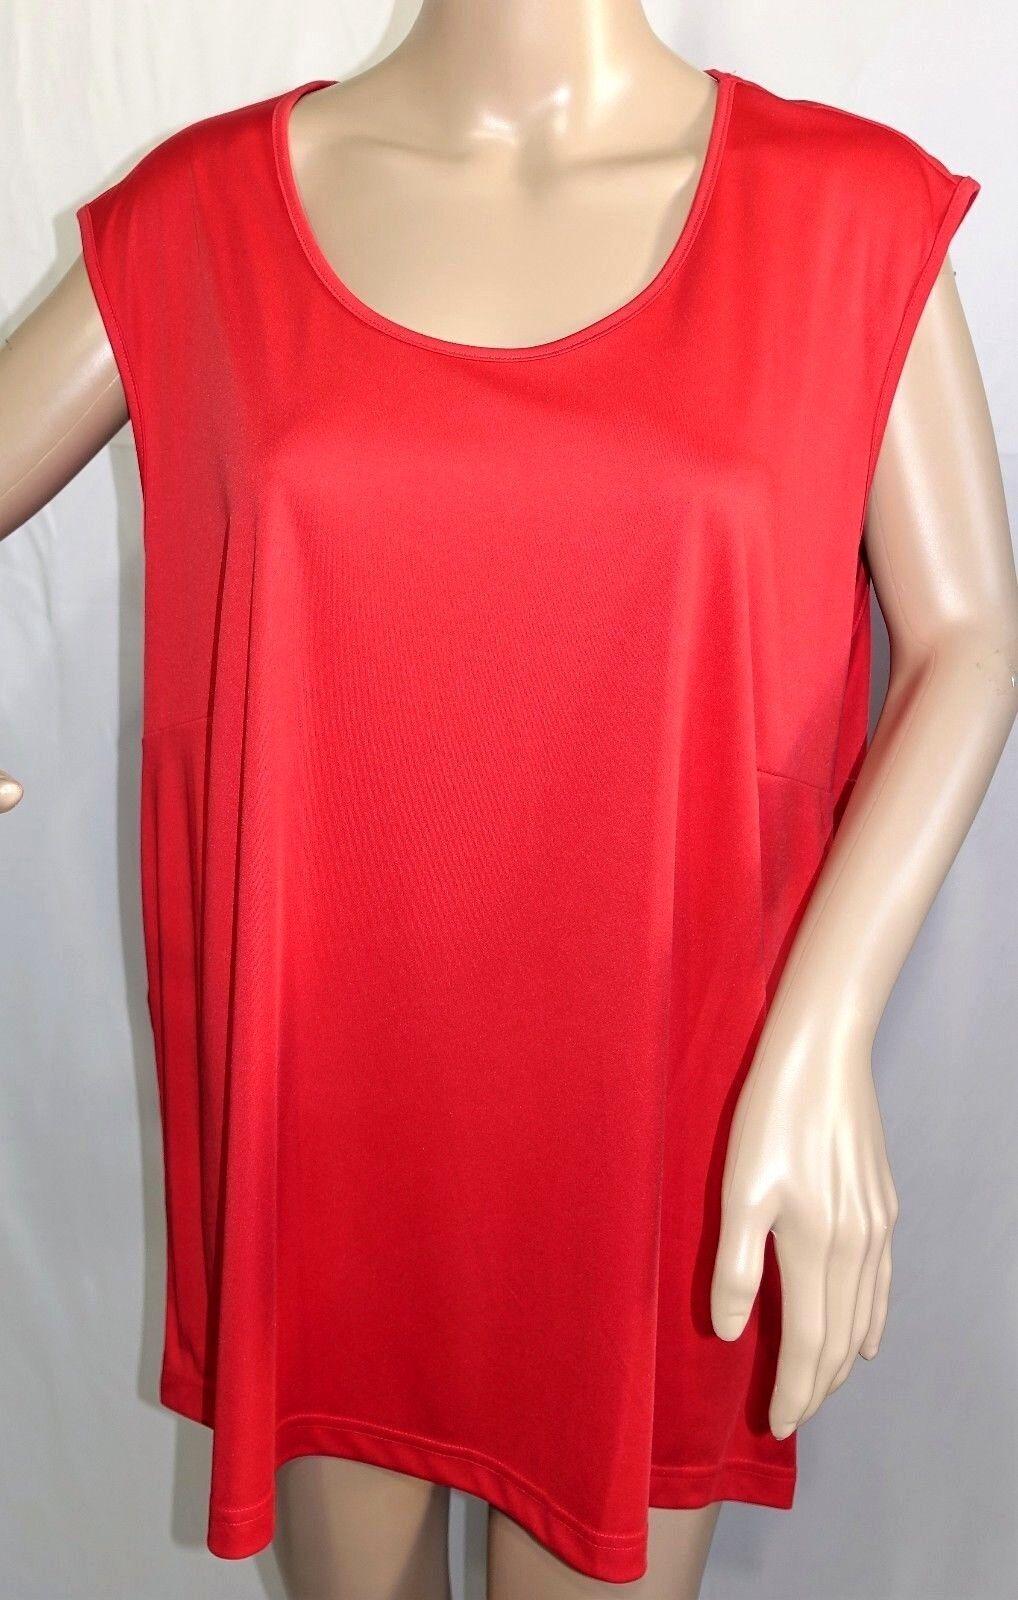 d998e39b983 Occident Women's Cotton Linen V-Collar Loose Tops Shirts Long Sleeve  Blouses J64